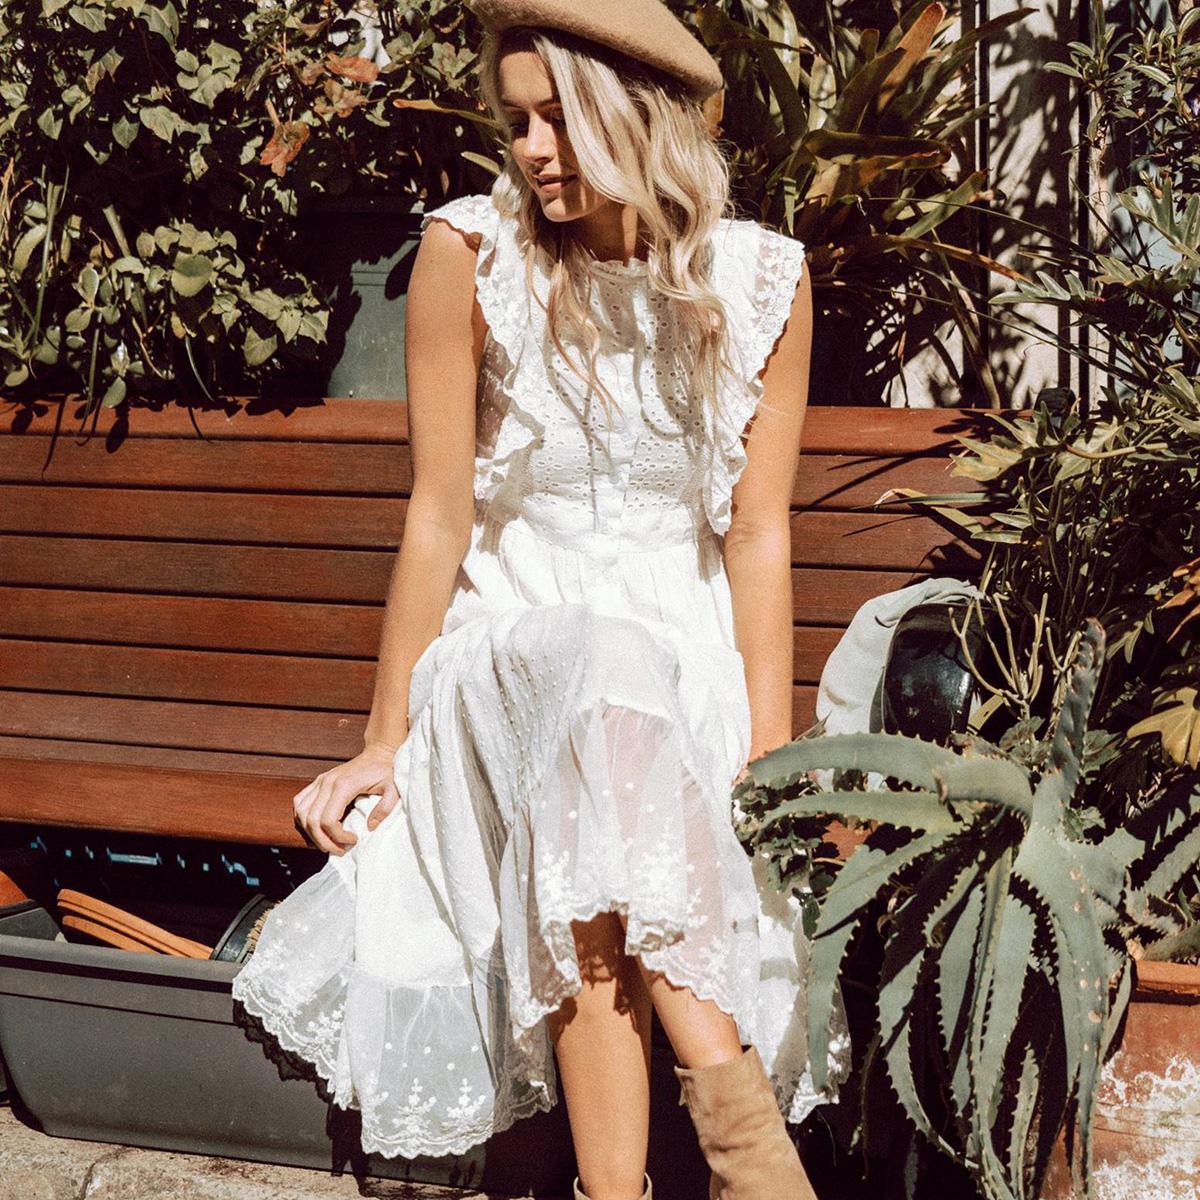 Paper Heart Clothing | Fashion Estb #paperheart #womensclothing #fashion